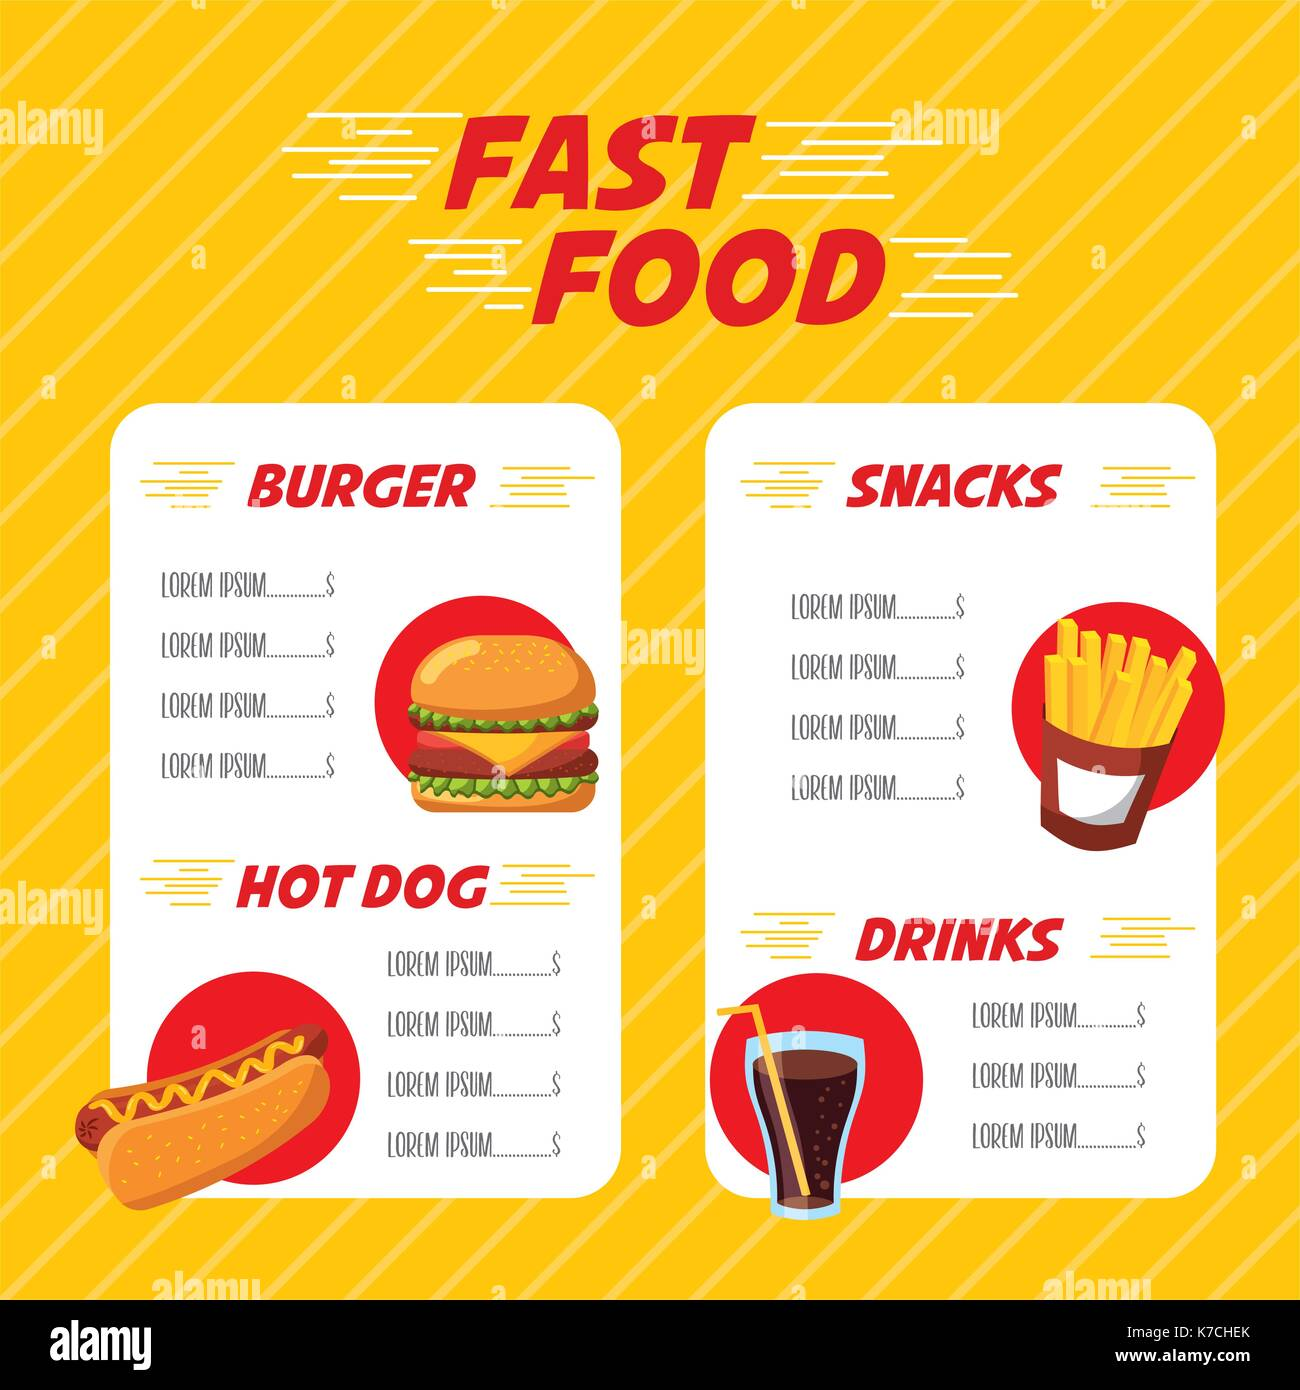 Fast Food Restaurant Menu Brochure Stock Vector Image Art Alamy